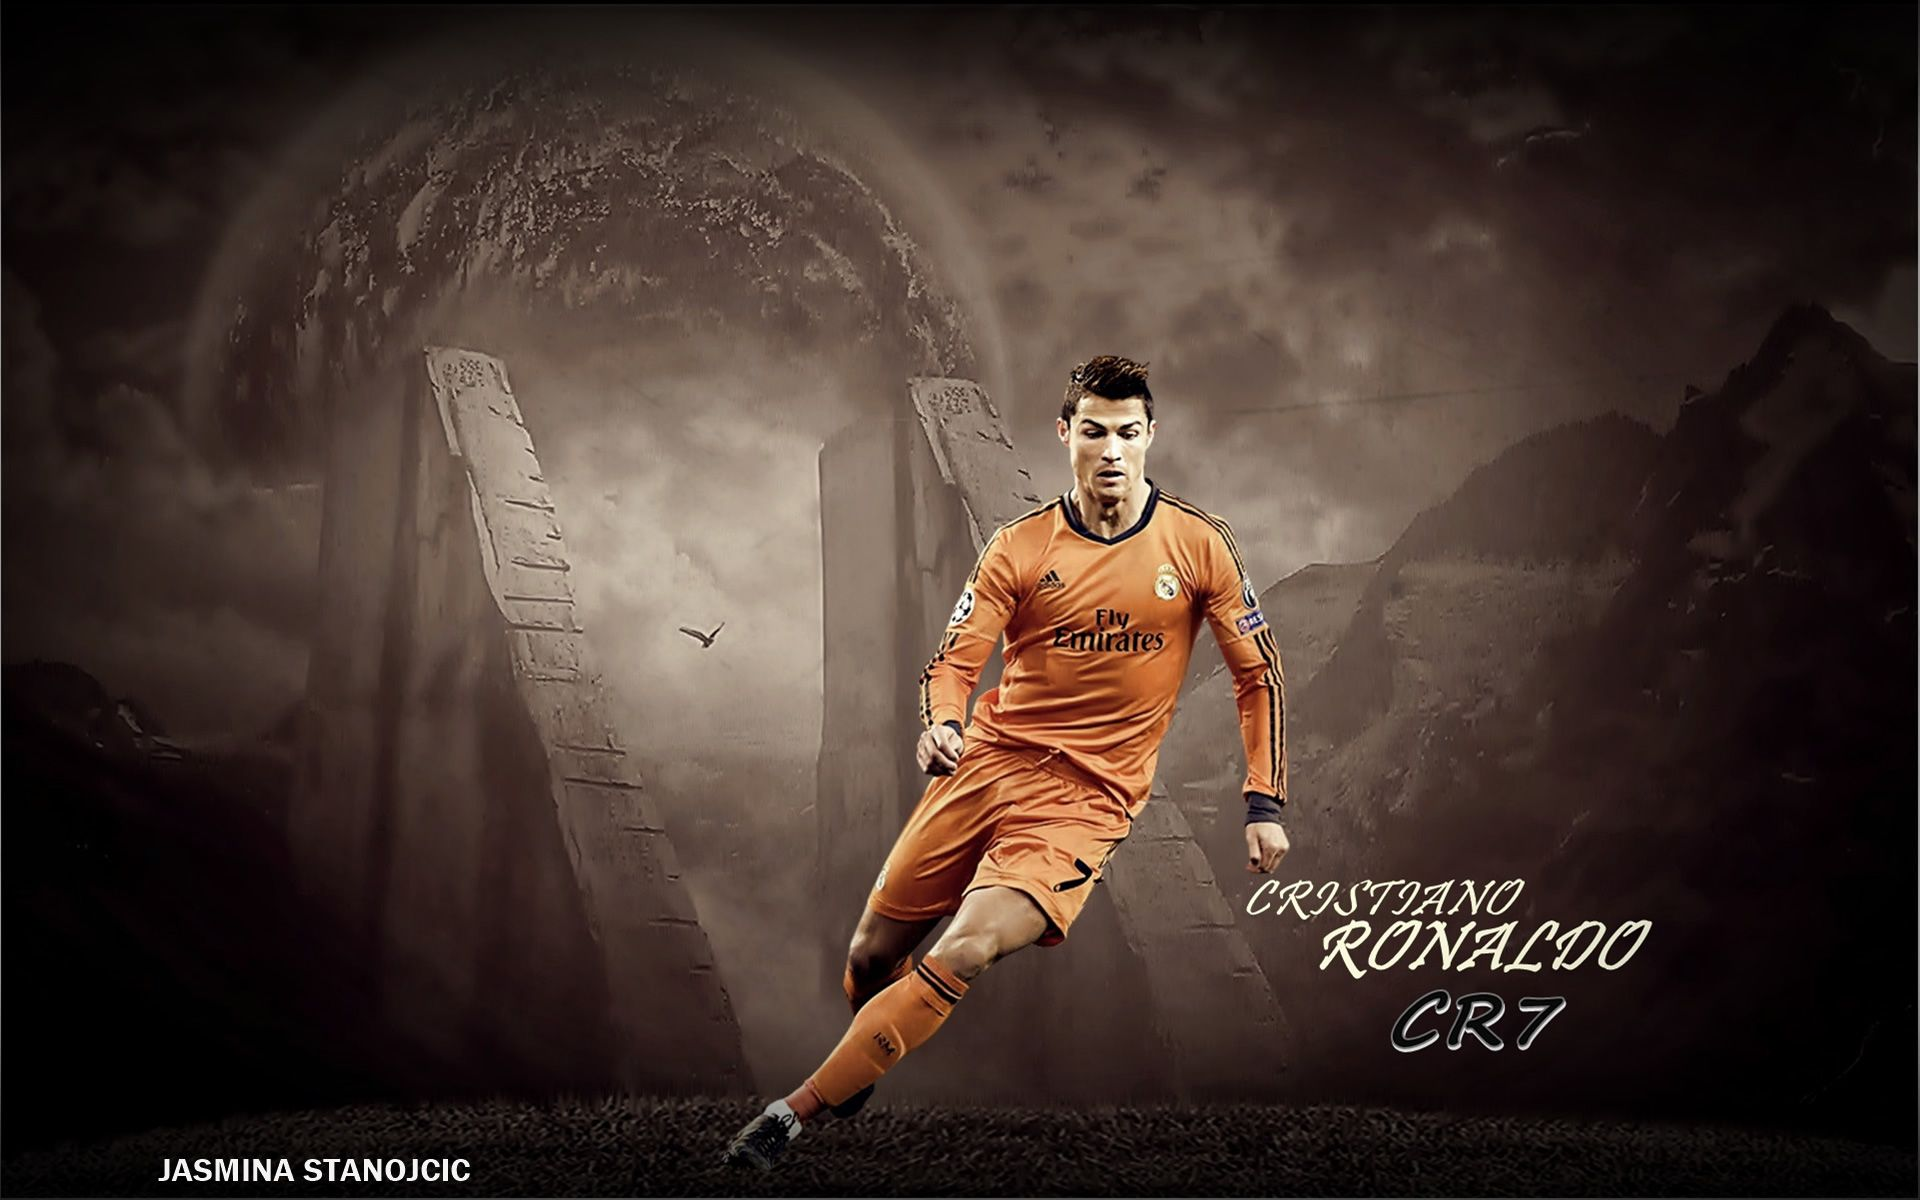 Hd wallpaper ronaldo - Cristiano Ronaldo Real Madrid Hd Desktop Wallpaper 1024 576 Images Of Cristiano Ronaldo Wallpapers